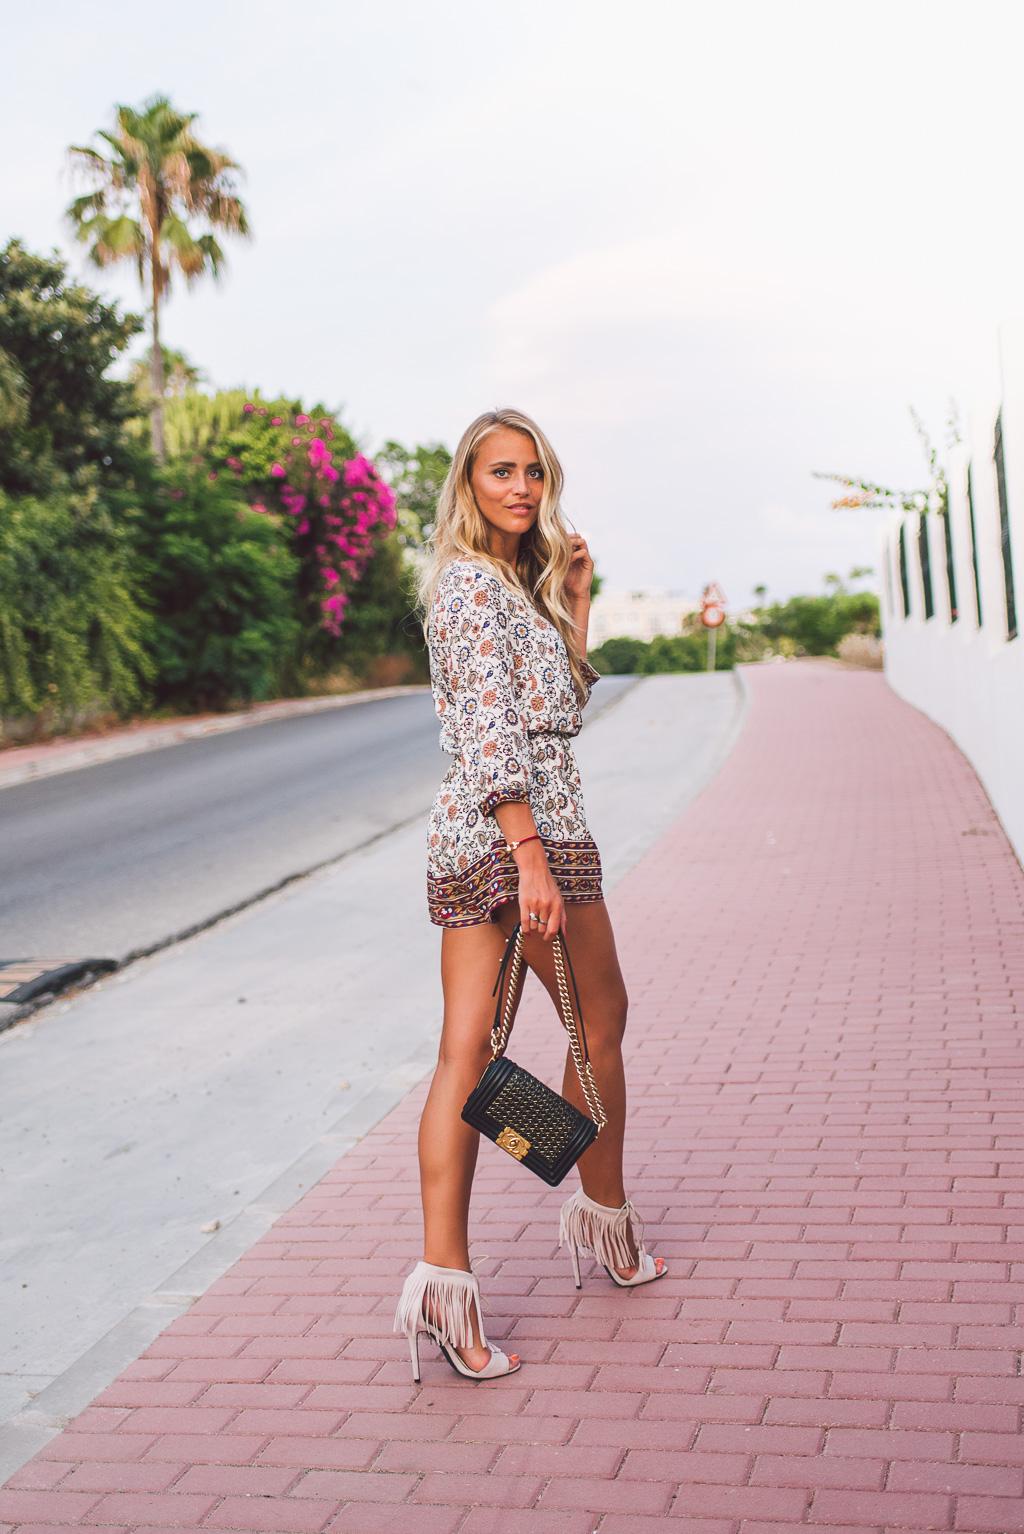 janni-deler-fringed-heels-bohemic-jumpsuit-outfitDSC_4772